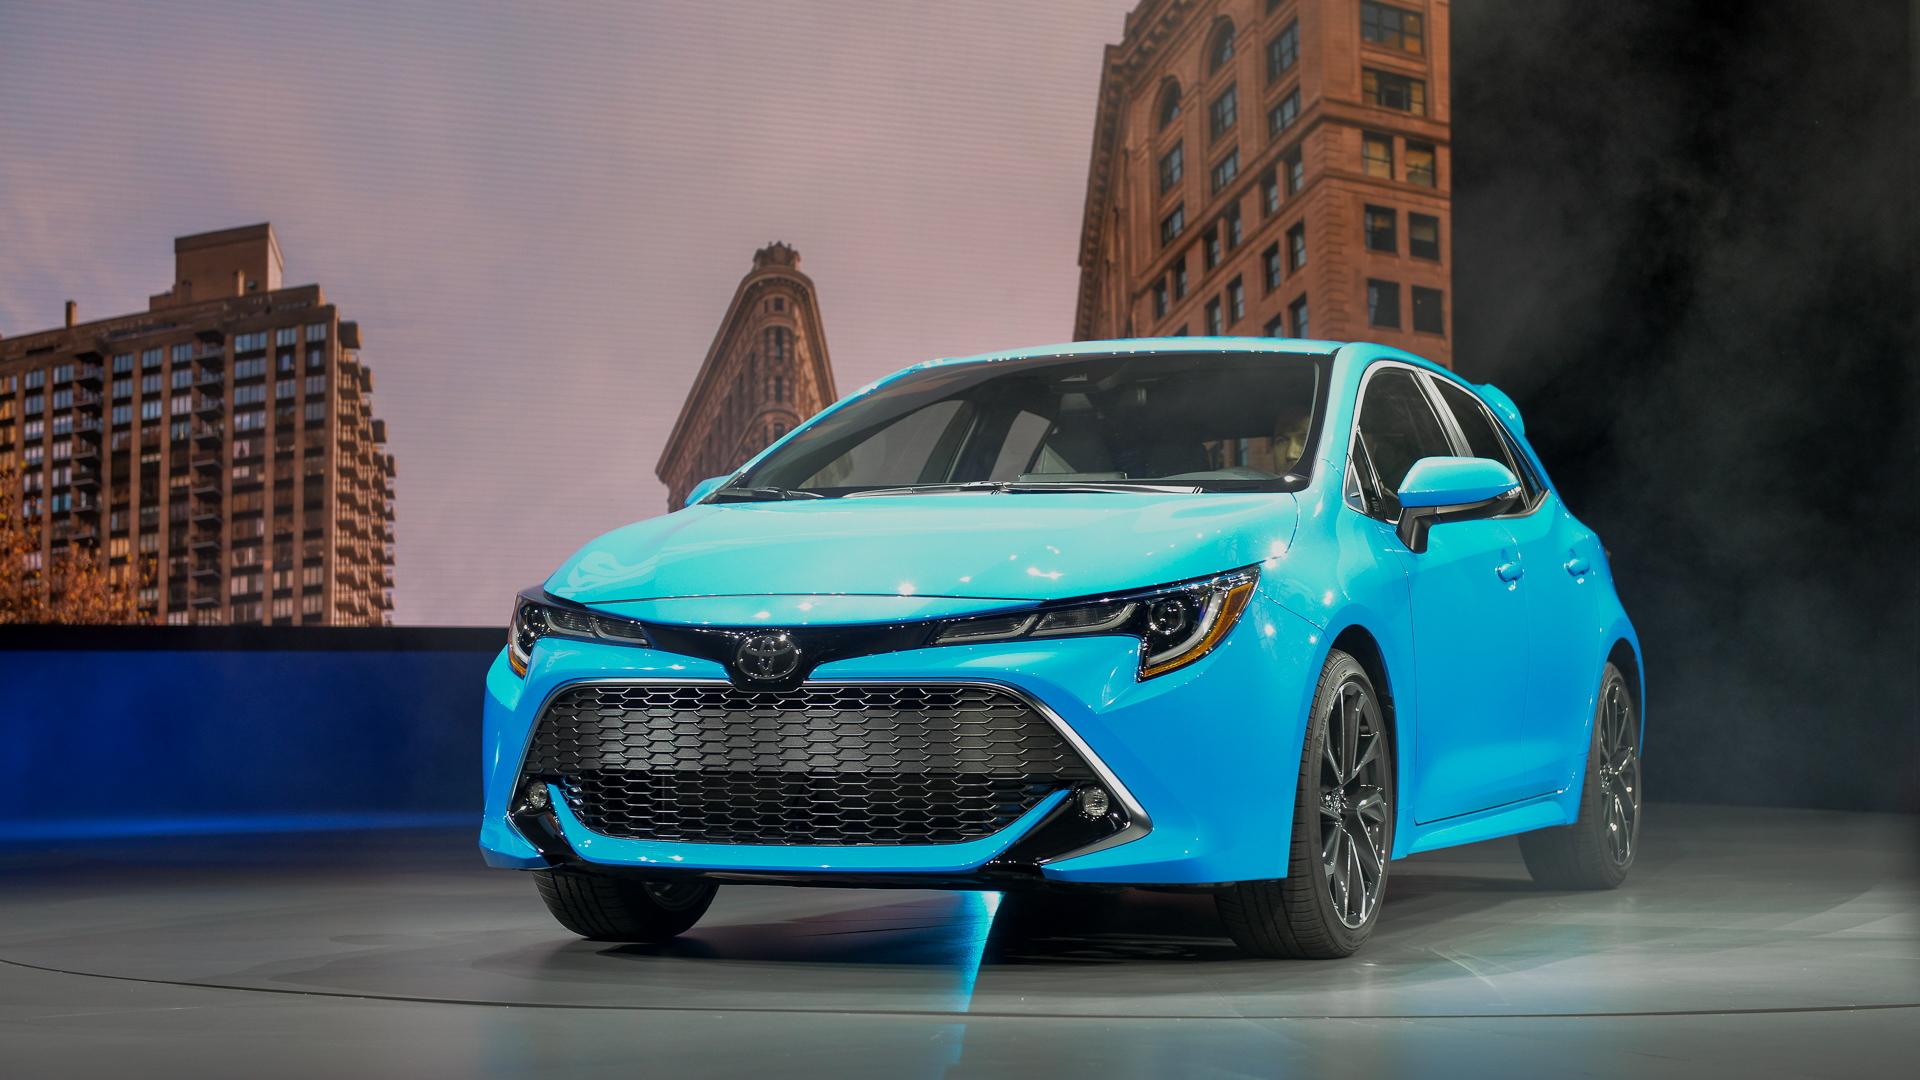 2019 Toyota Corolla hatchback, 2018 New York auto show